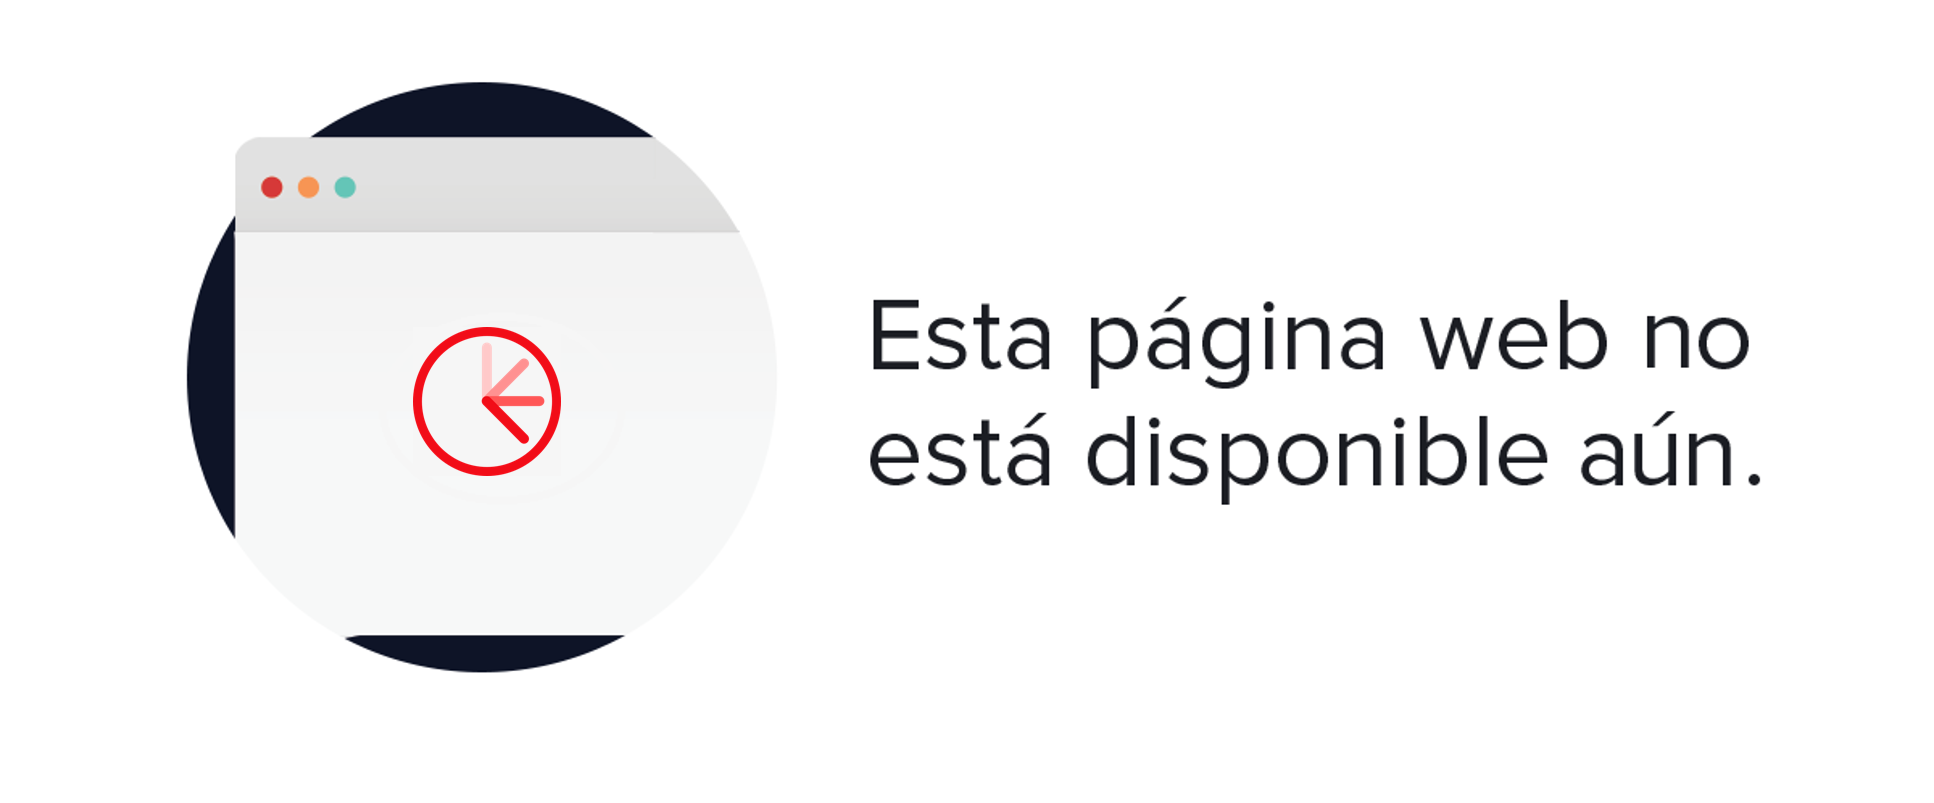 GAP - Leggin capri de mujer Gap deportivo Multicolor 001085660200198002 - TFJRMHI